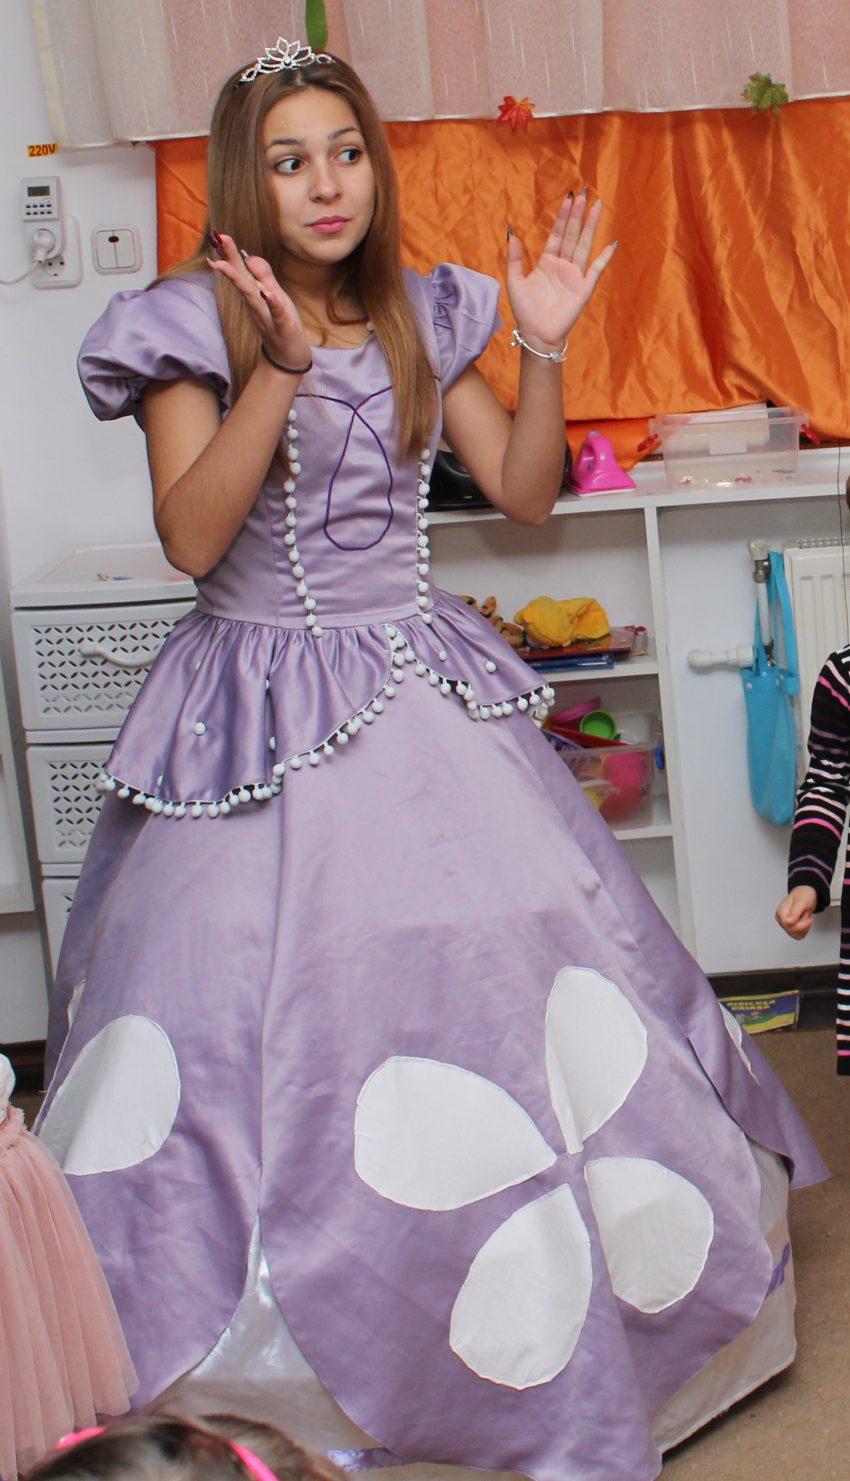 Printesa Sofia - cel mai iubit si cunoscut personaj feminin de la Disneyland